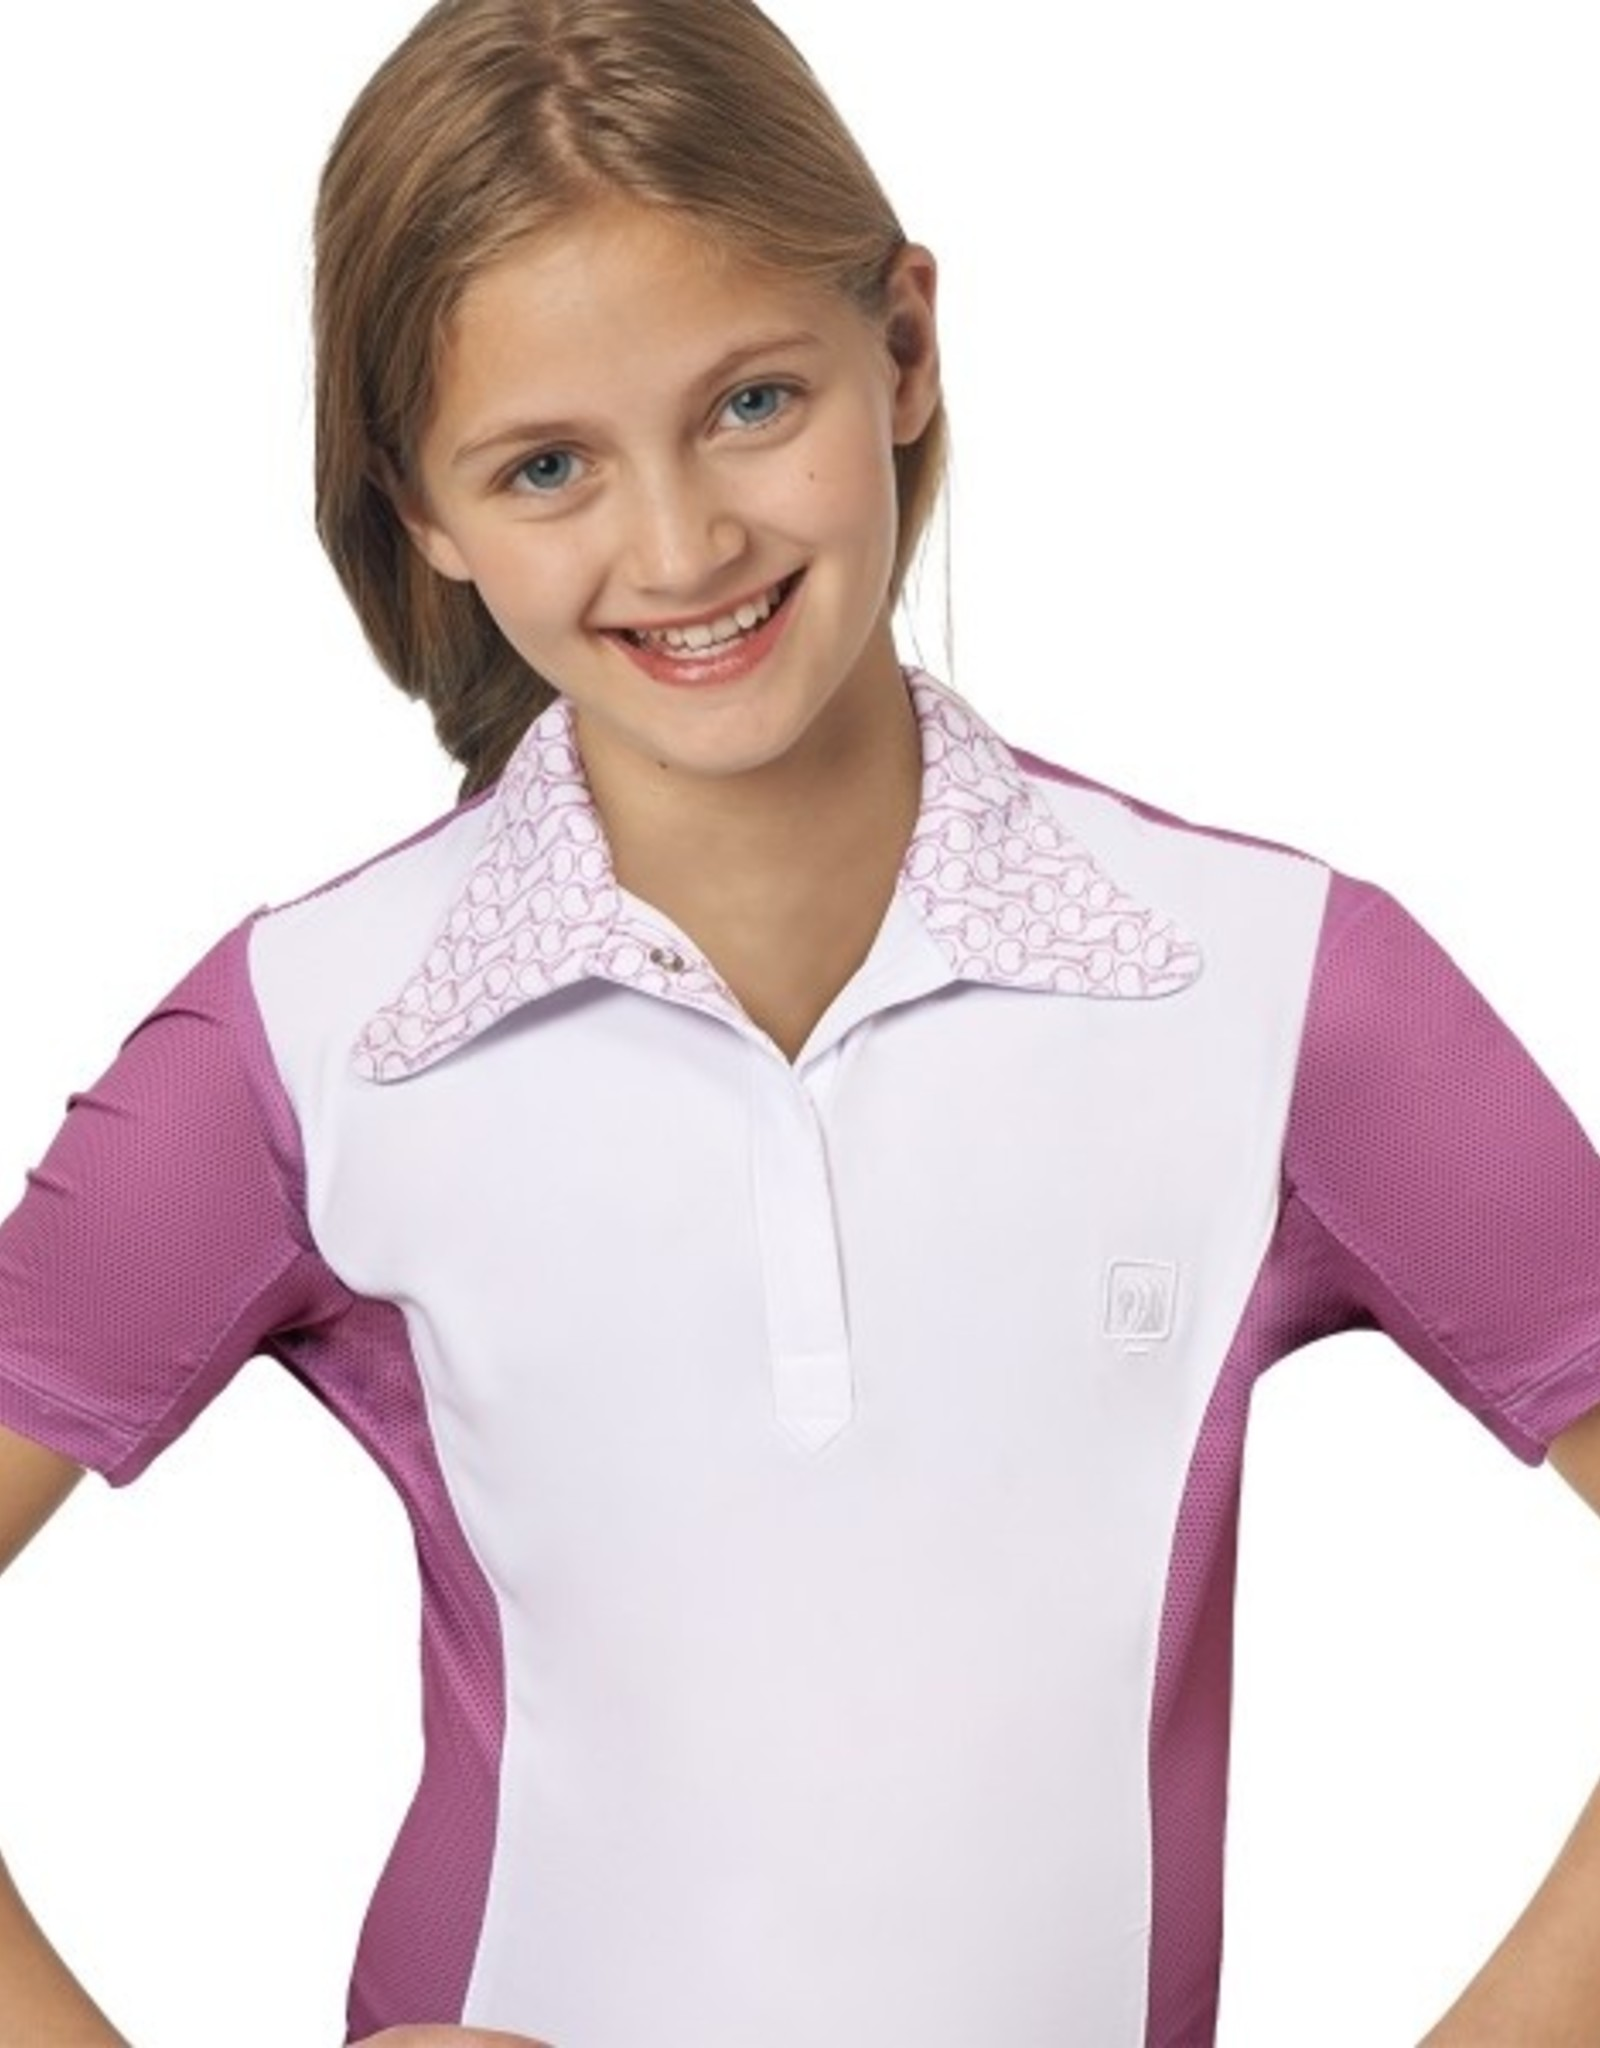 Romfh Kids' Signature Short Sleeve Show Shirt